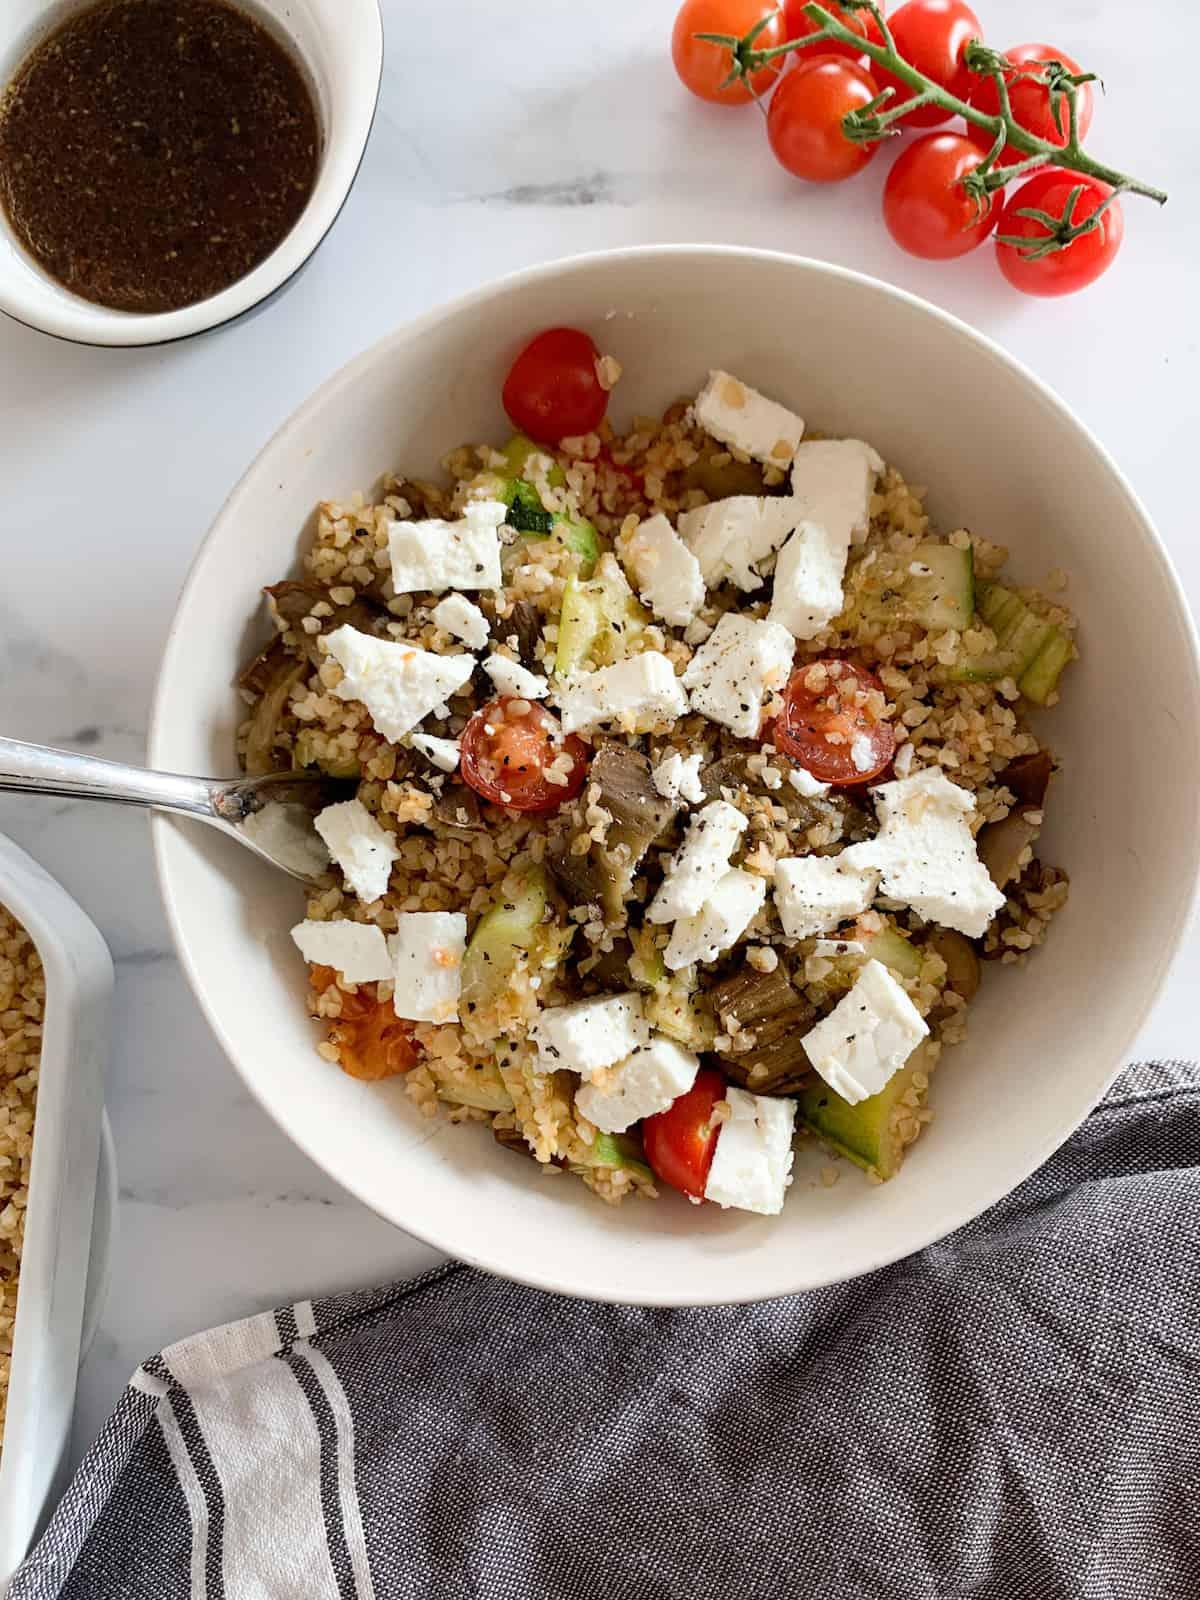 Salad bowl with feta